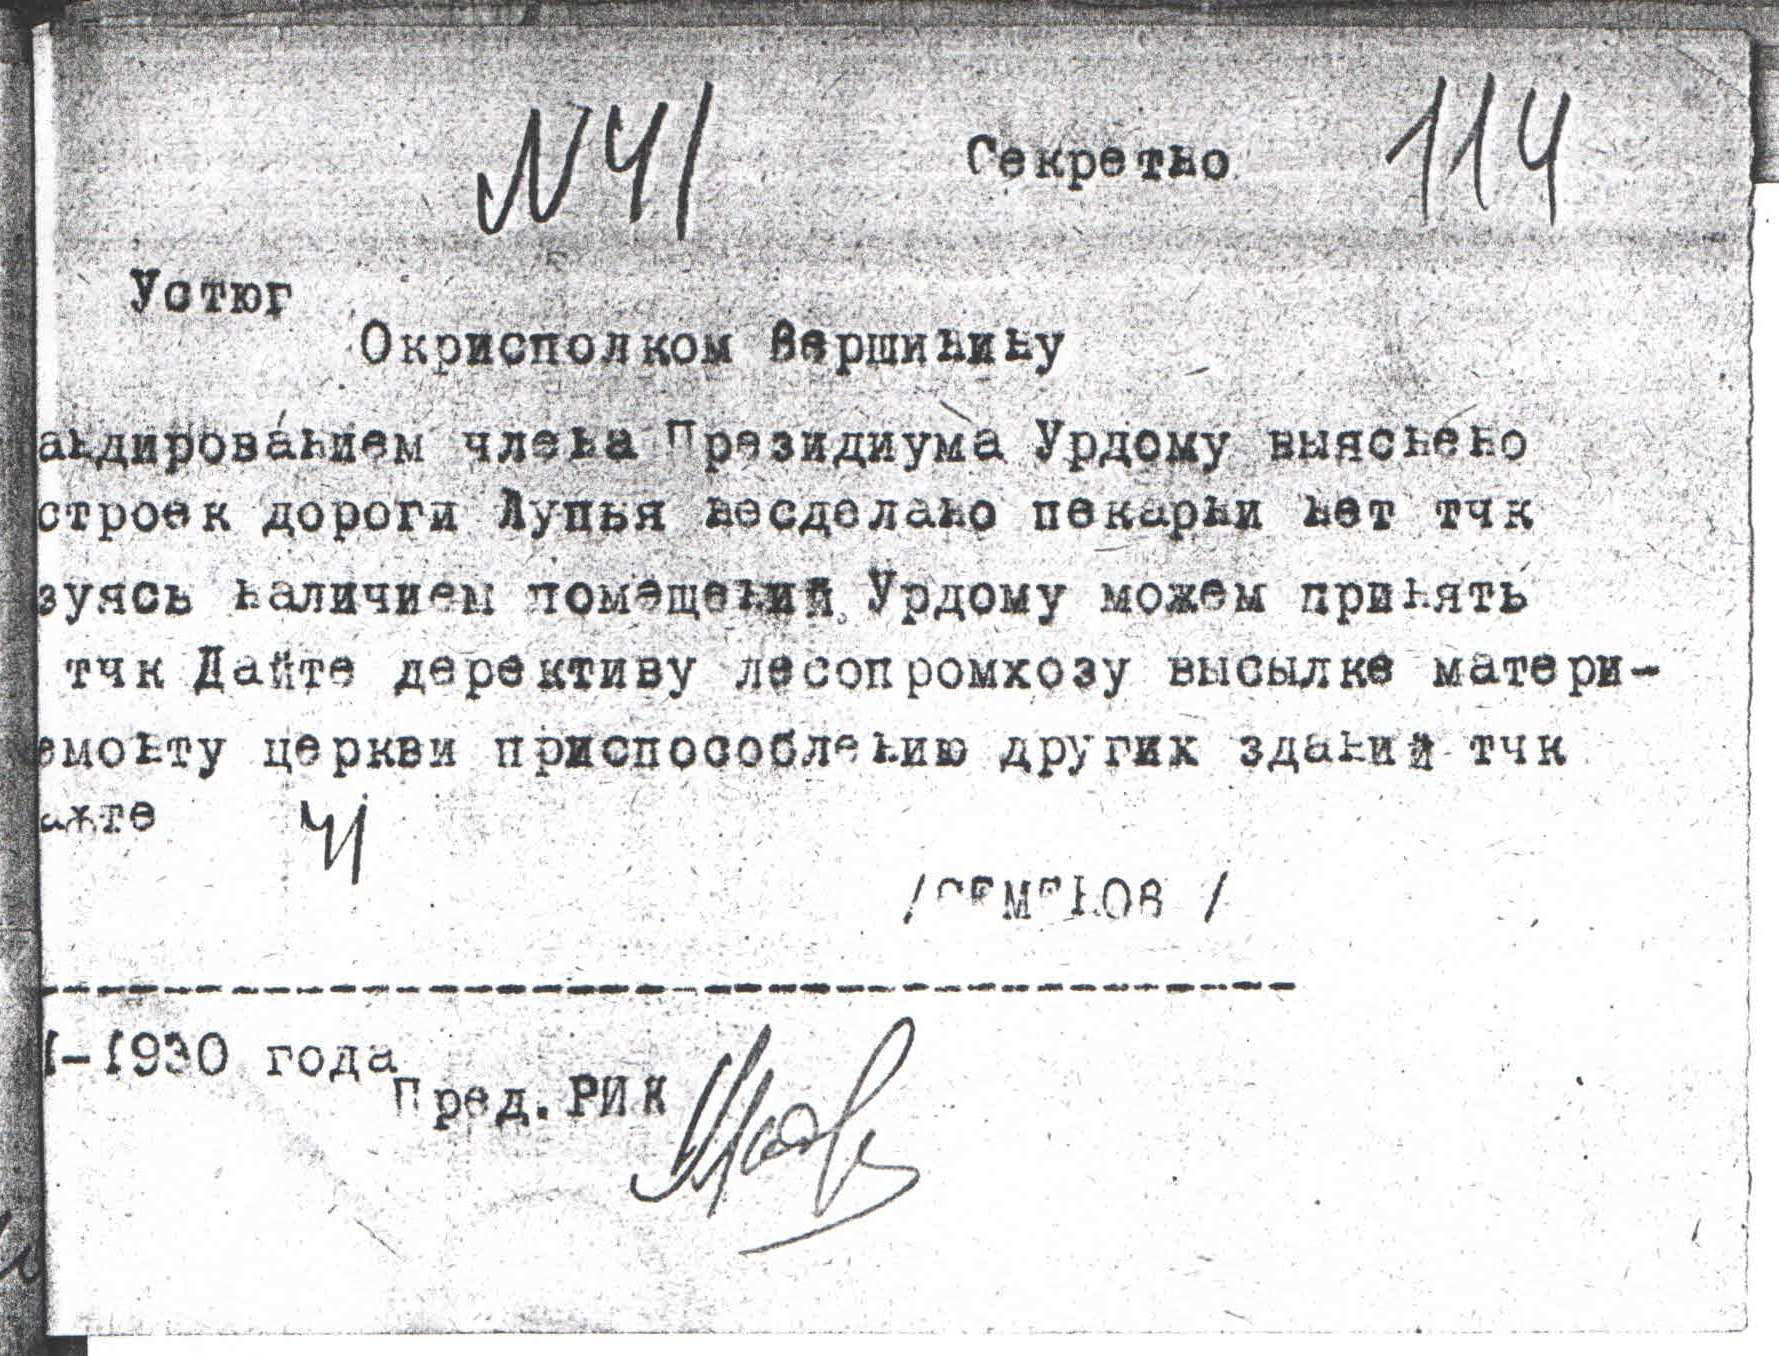 ГААО ф1831 оп1 д291 л114. Телеграмма от 01.06.1930 Окрисполком Верещагину, Семенов.